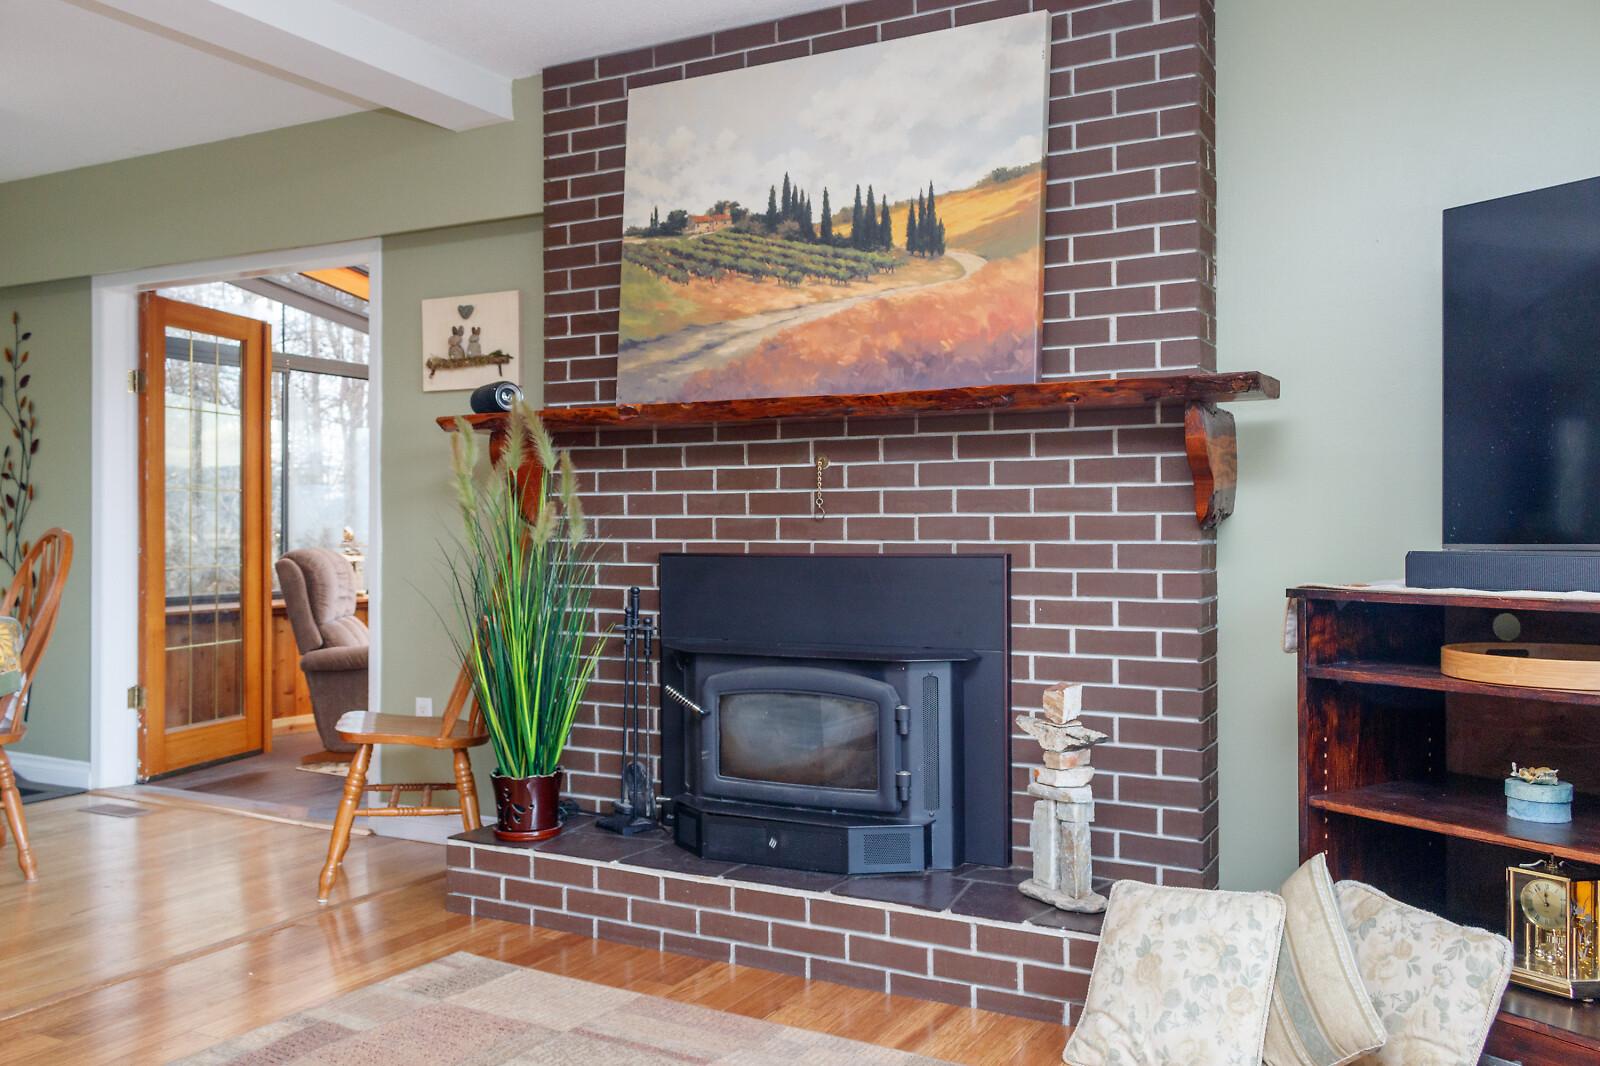 3025 Dogwood Rd, Duncan, British Columbia  V9L 6R5 - Photo 6 - 871254